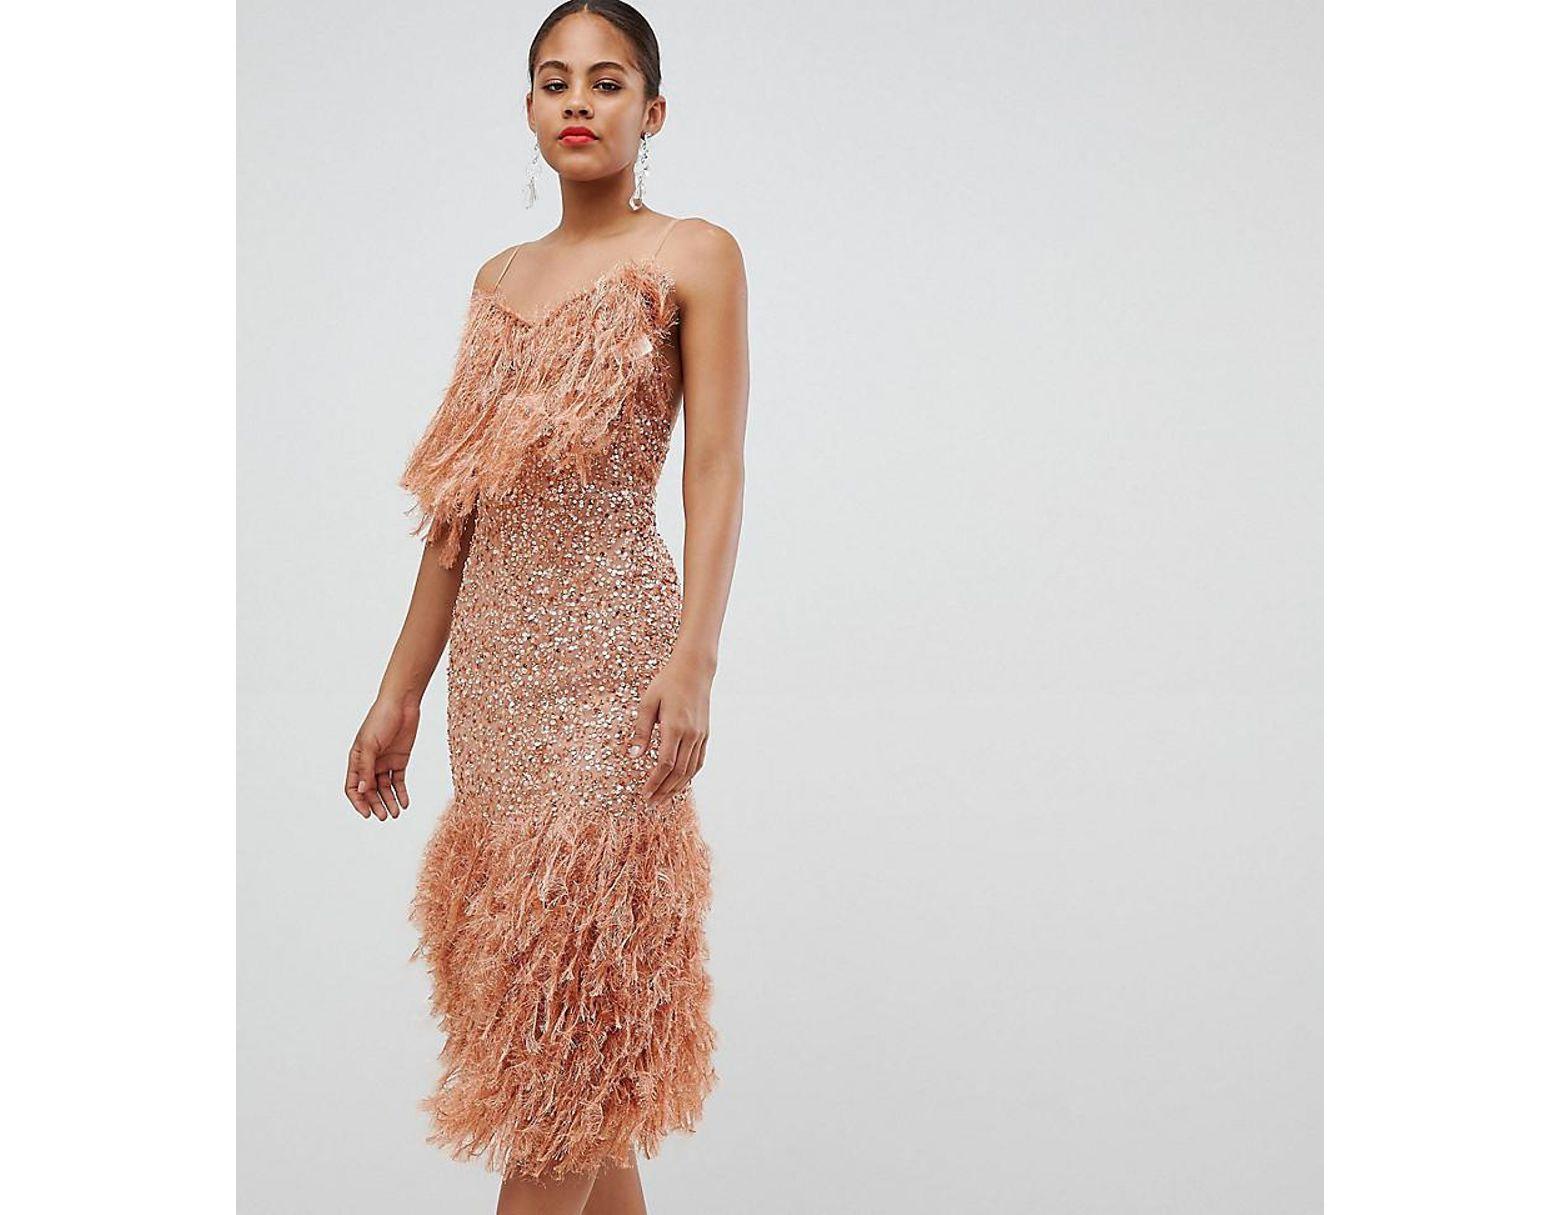 50b8b9c1aebd4 ASOS Asos Design Tall Feather Effect Trim Sequin Midi Bodycon Dress in Pink  - Lyst